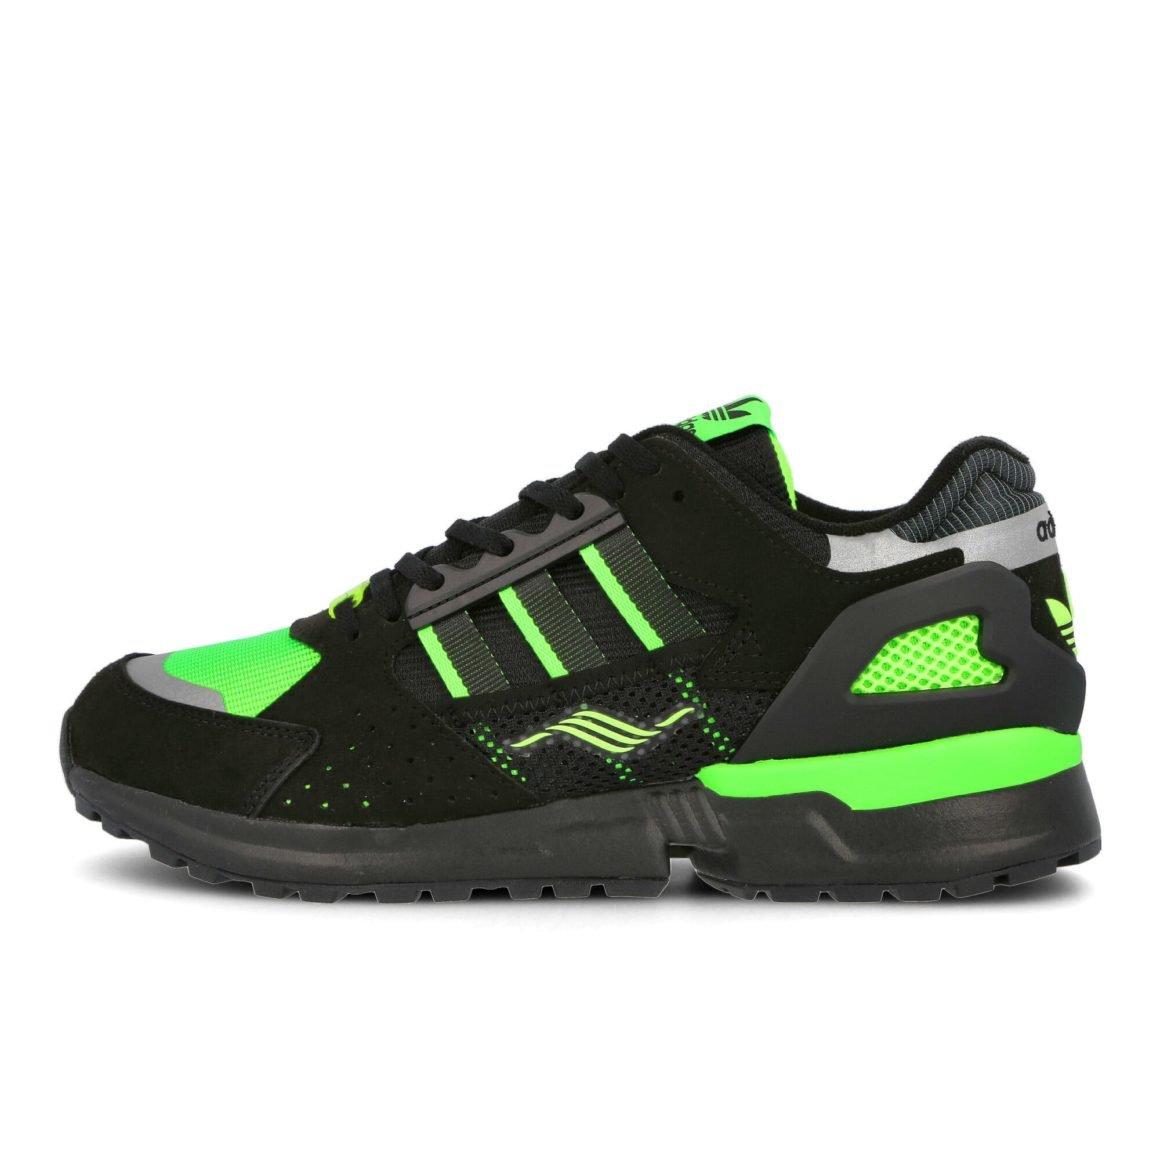 adidas zx10000 c eg8964